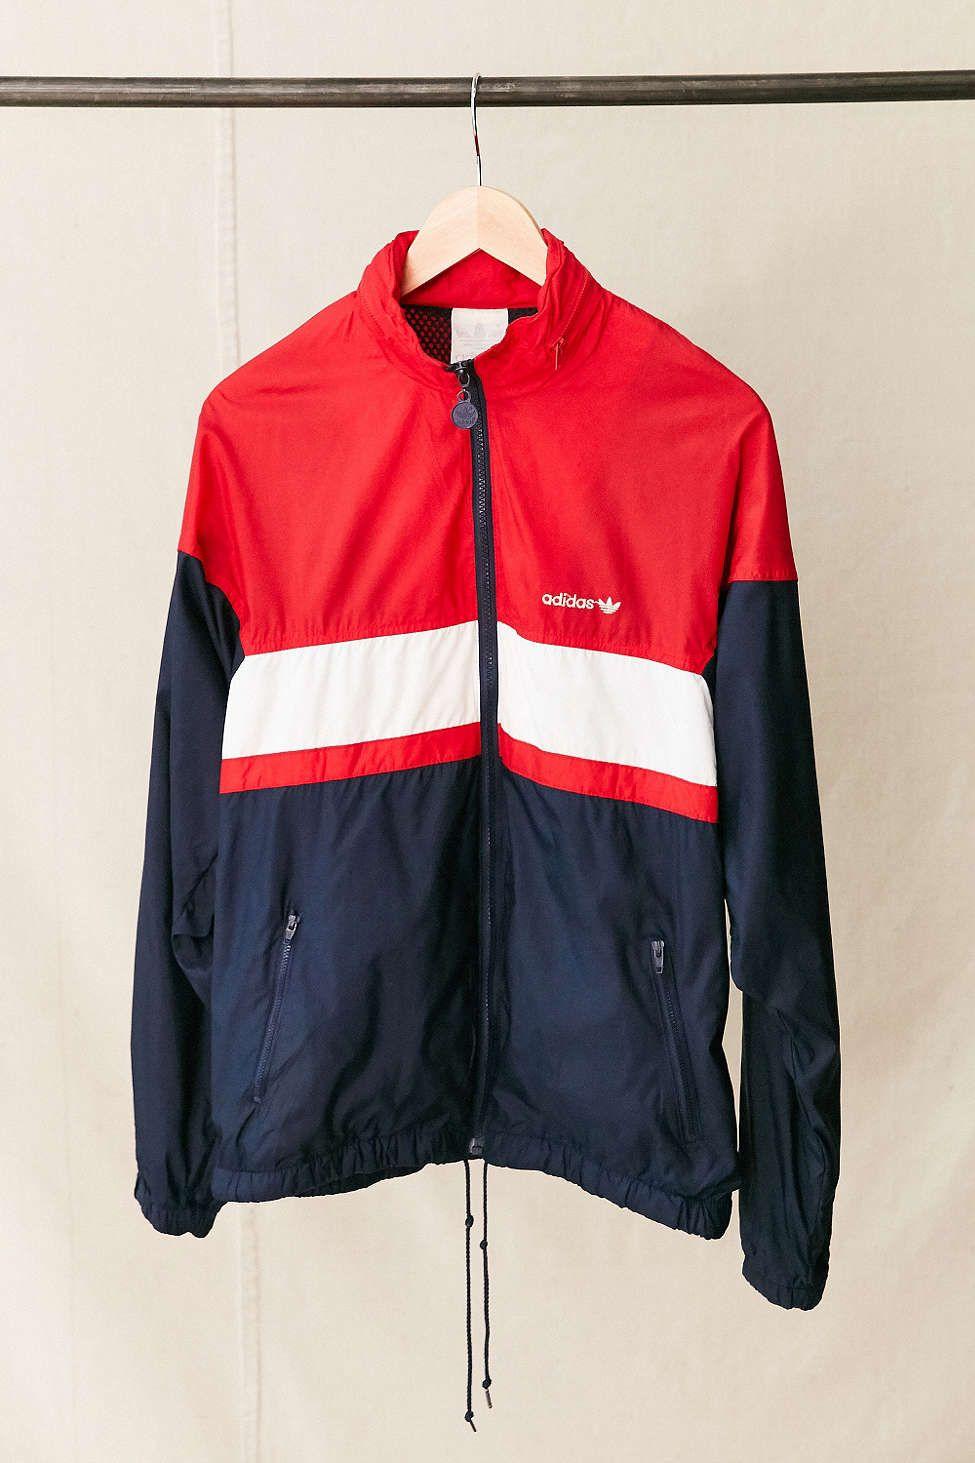 Vintage Adidas Red White Blue Windbreaker Jacket Vintage Or